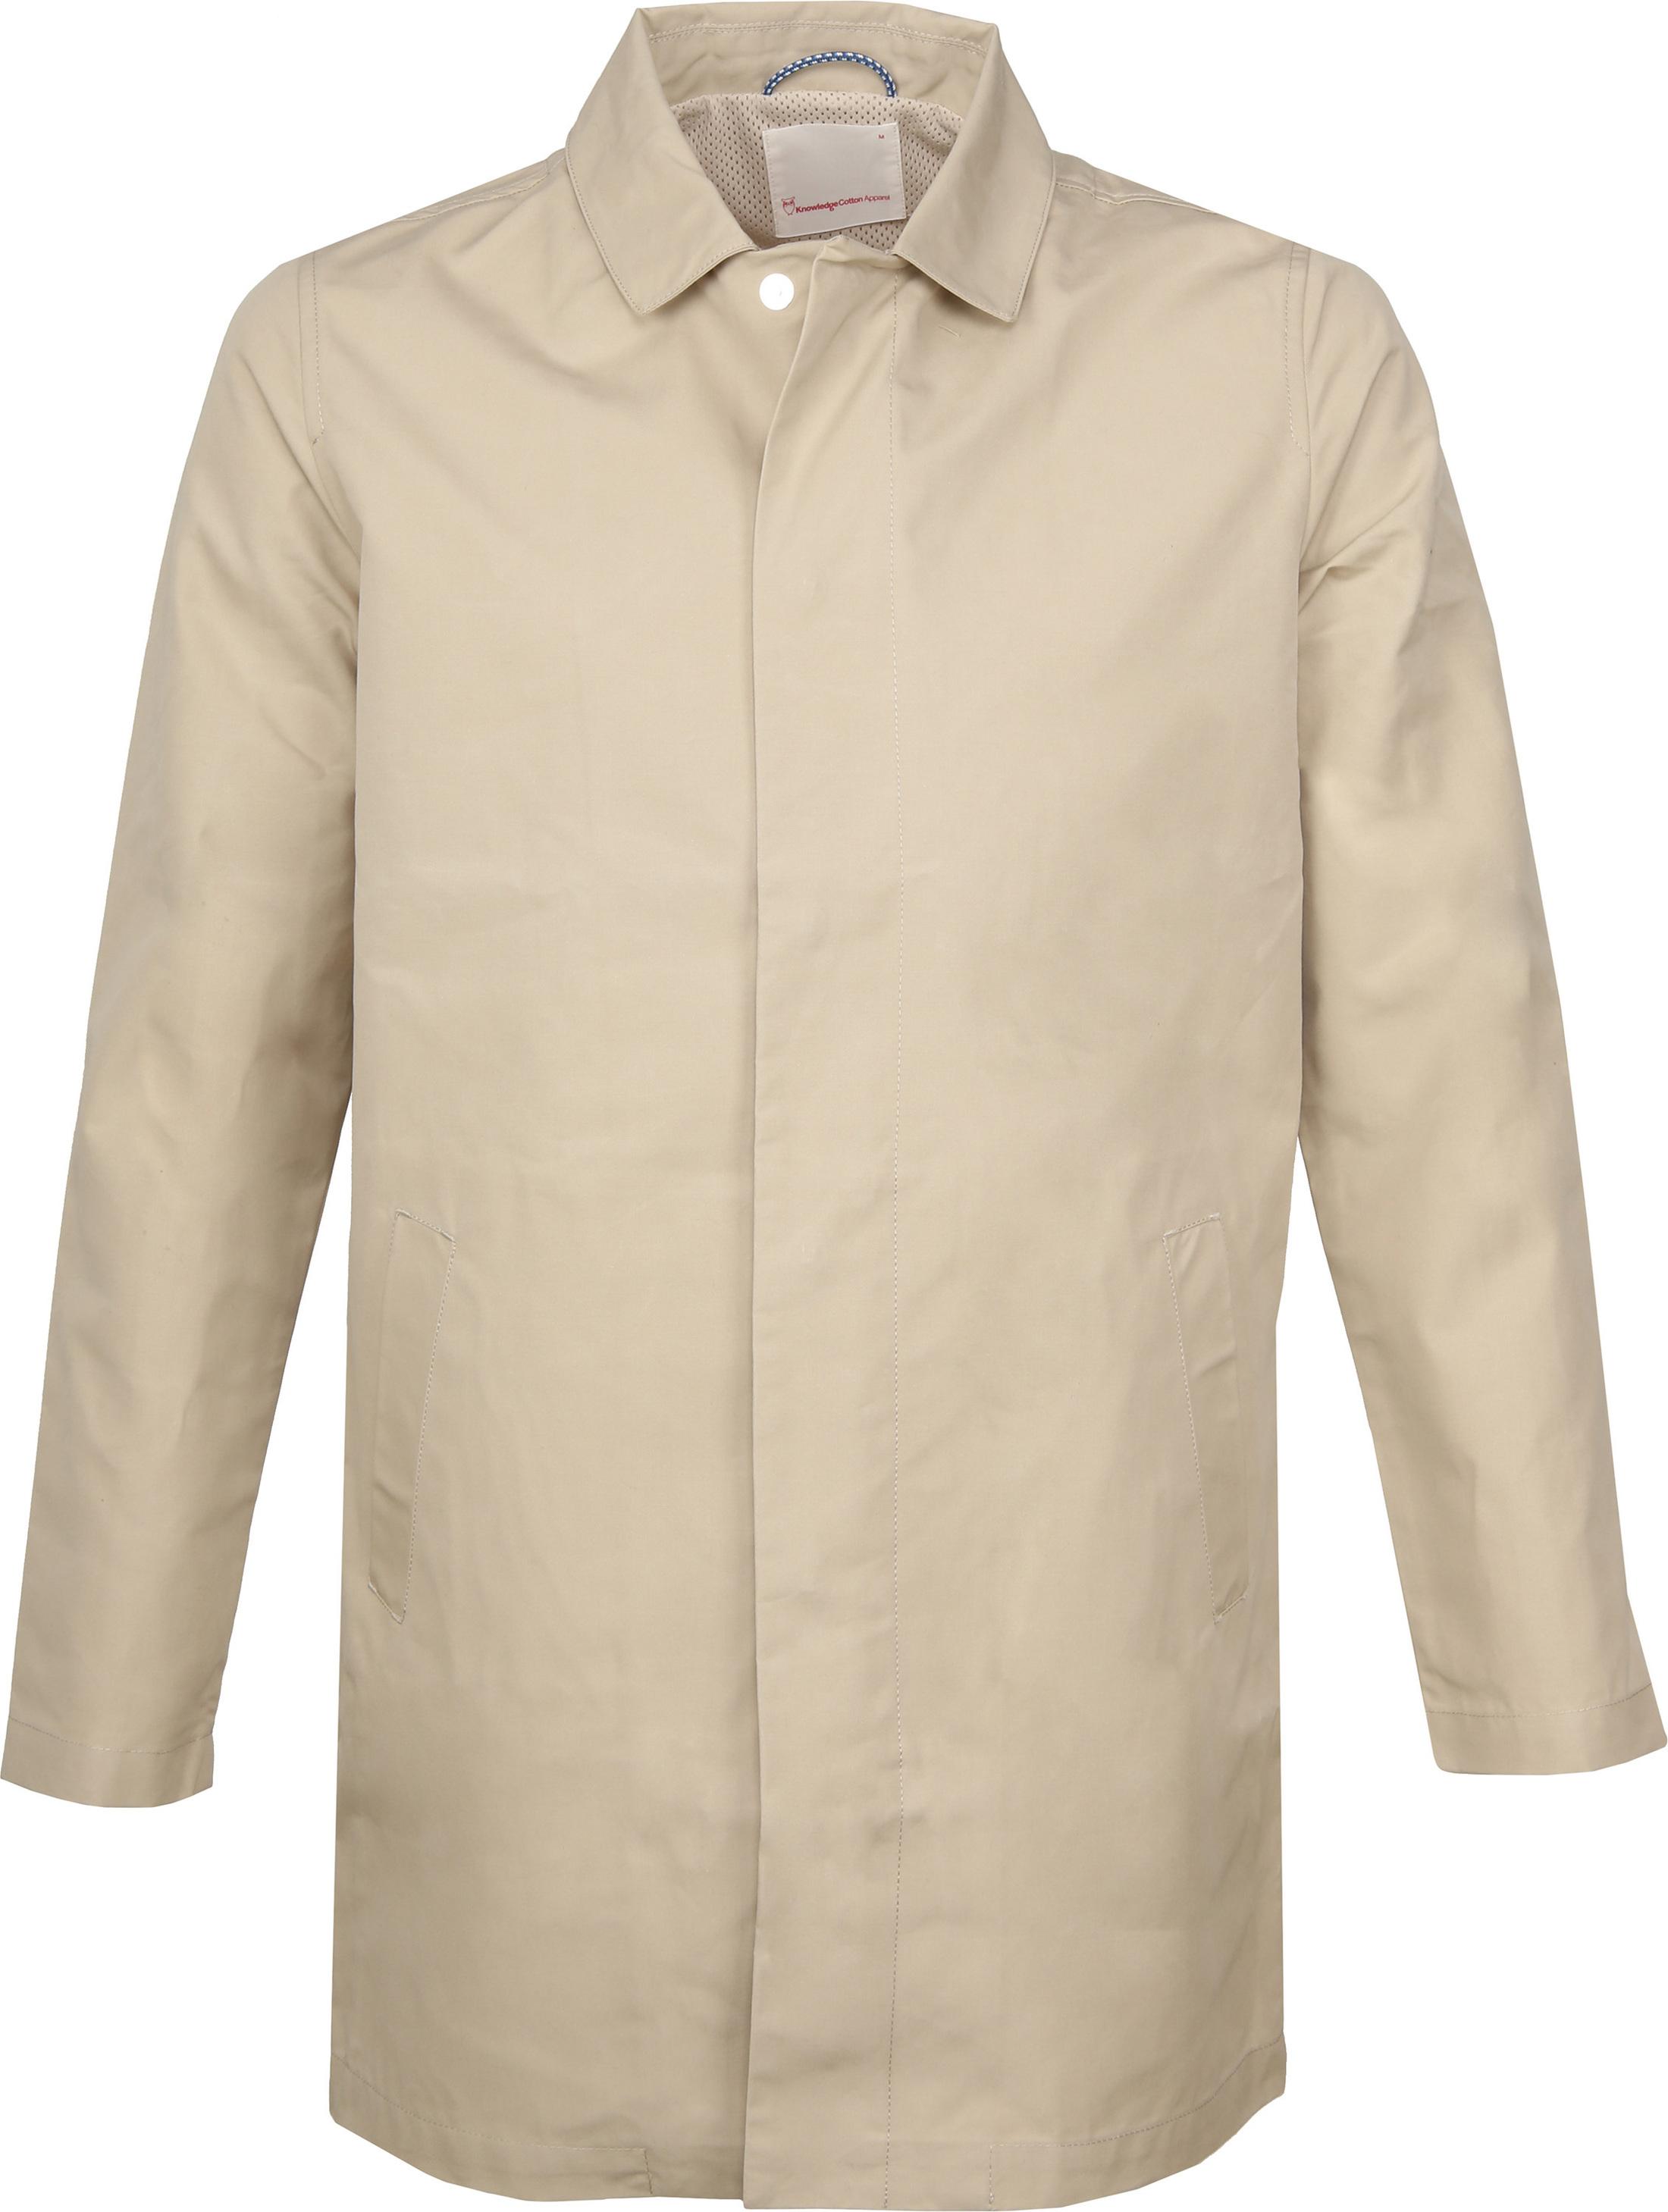 Knowledge Cotton Apparel Carcoat Beige foto 0